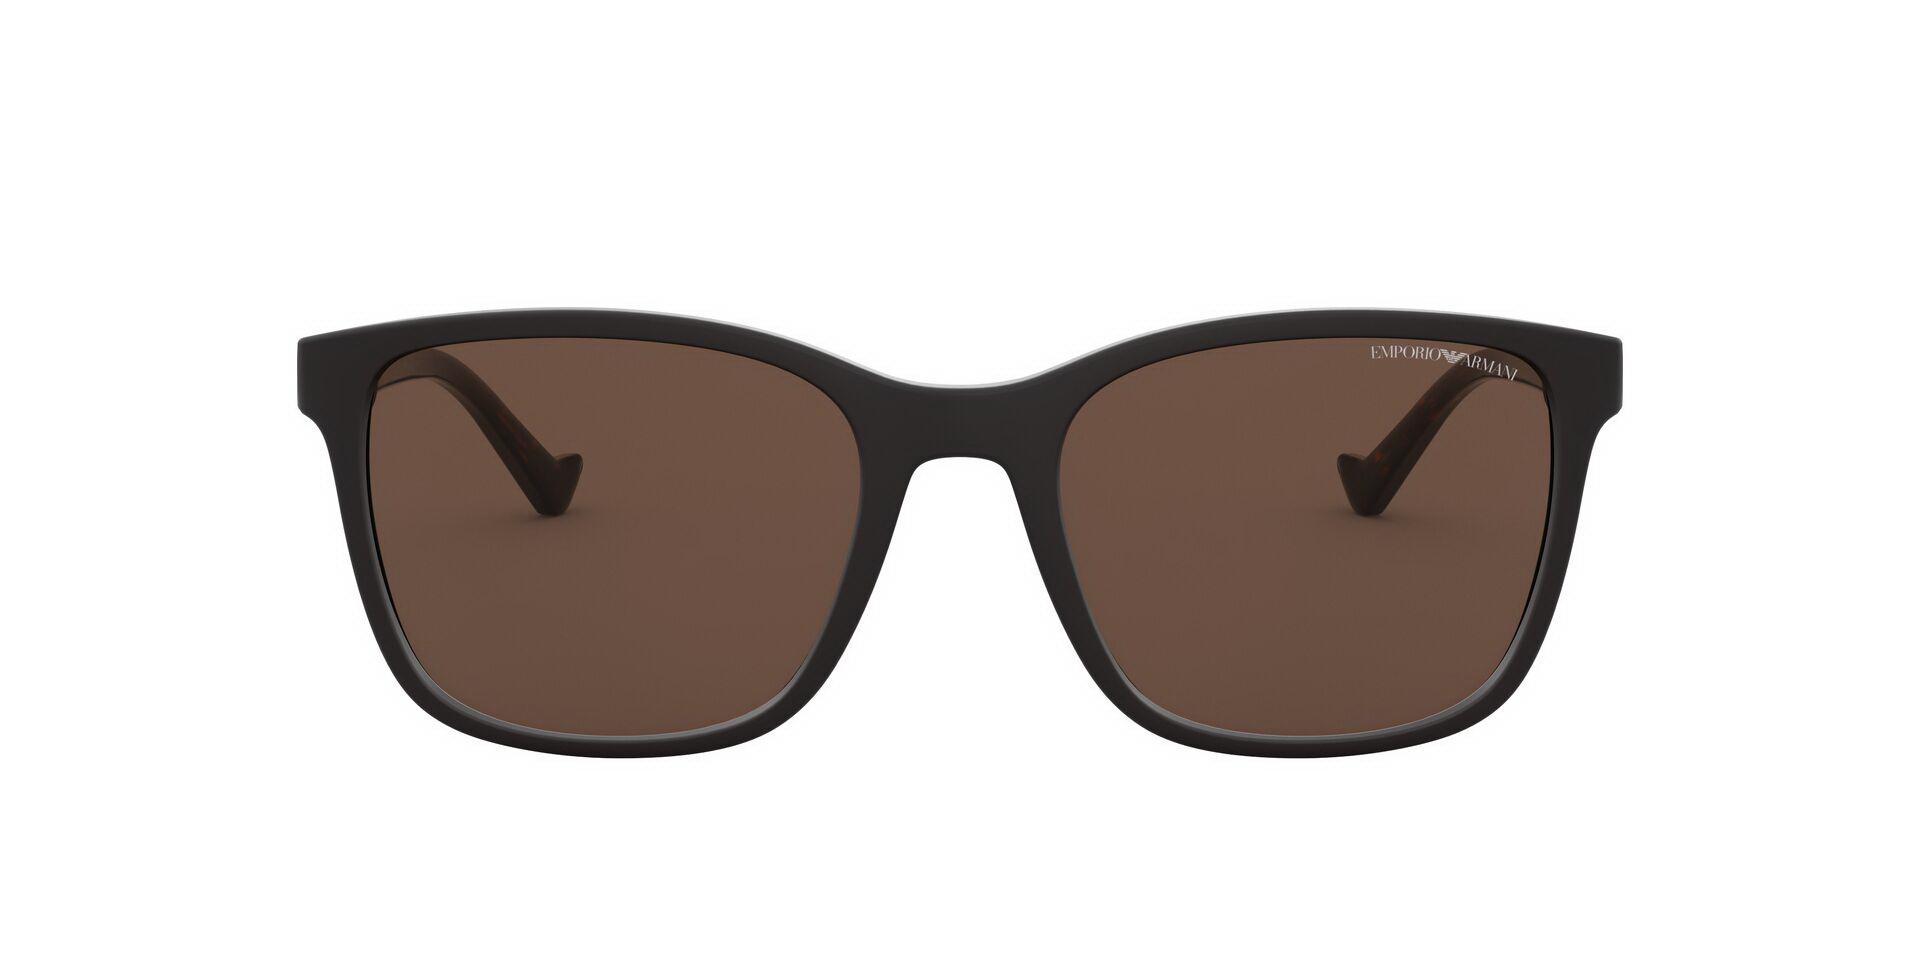 Солнцезащитные очки Очки с/з Emporio Armani 0EA4139 501773